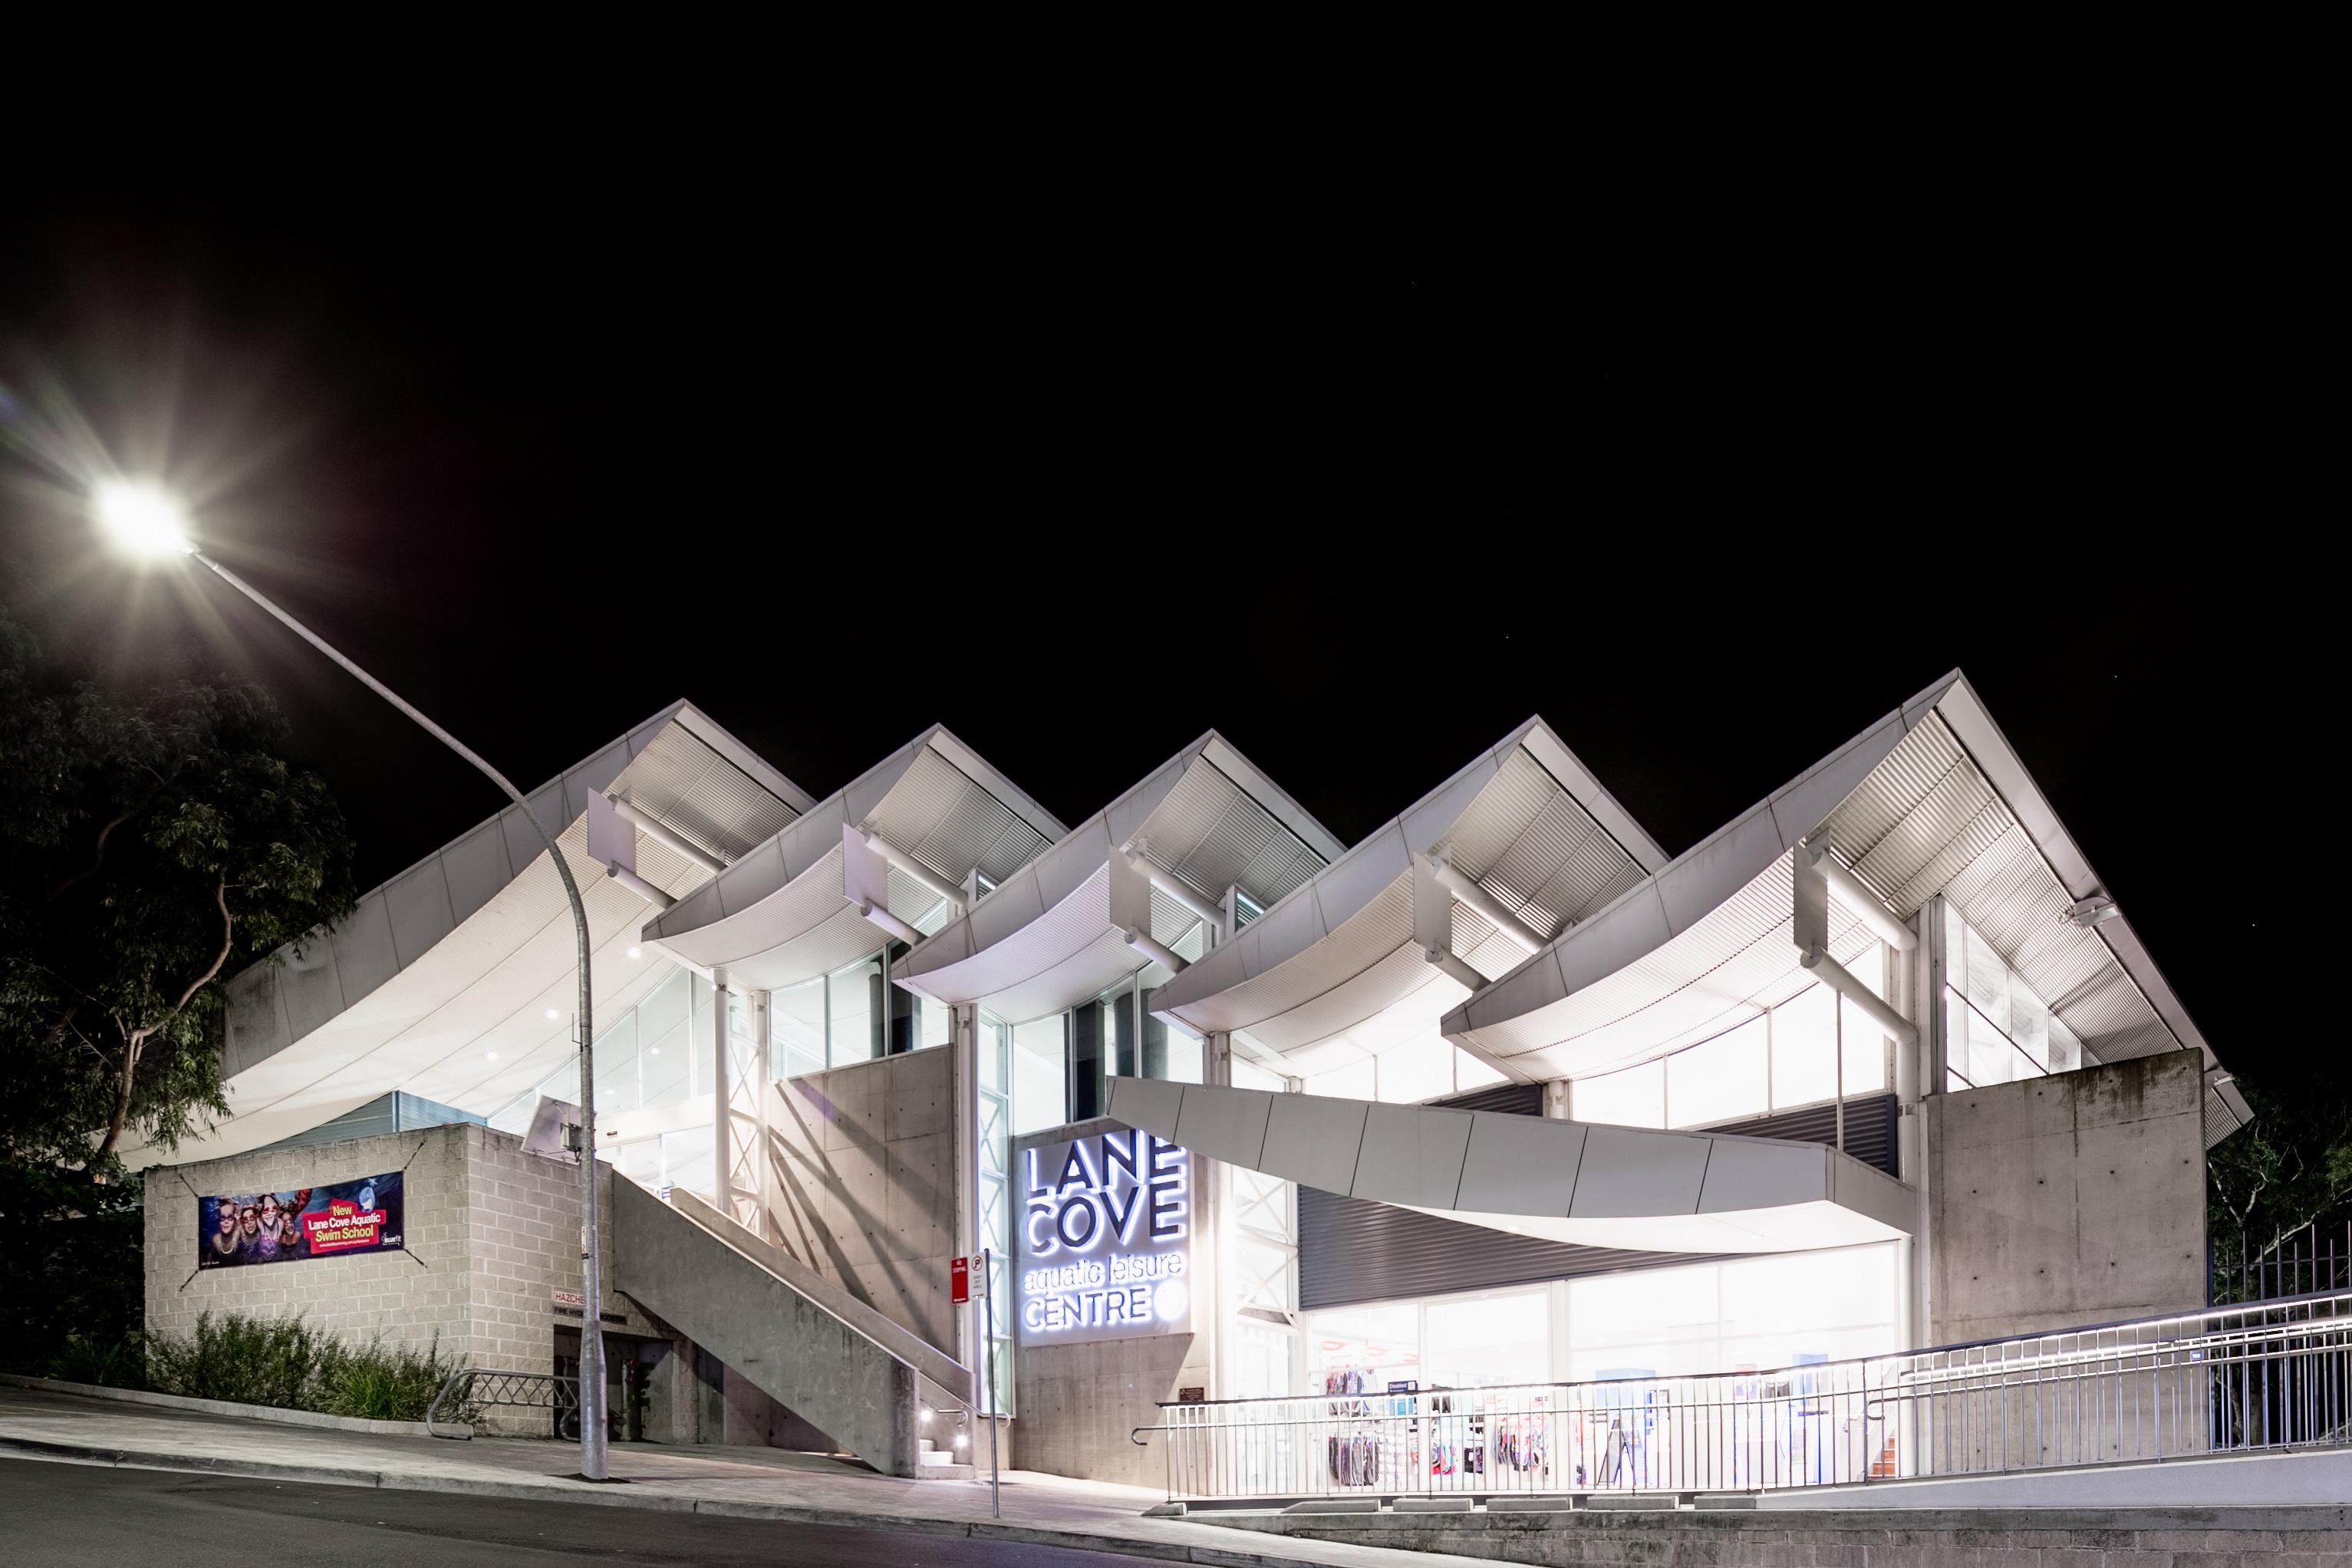 Gez-Xavier-Mansfield-Photography-Avant-Constructions-LaneCove-Aquatic-Project-October2017-38